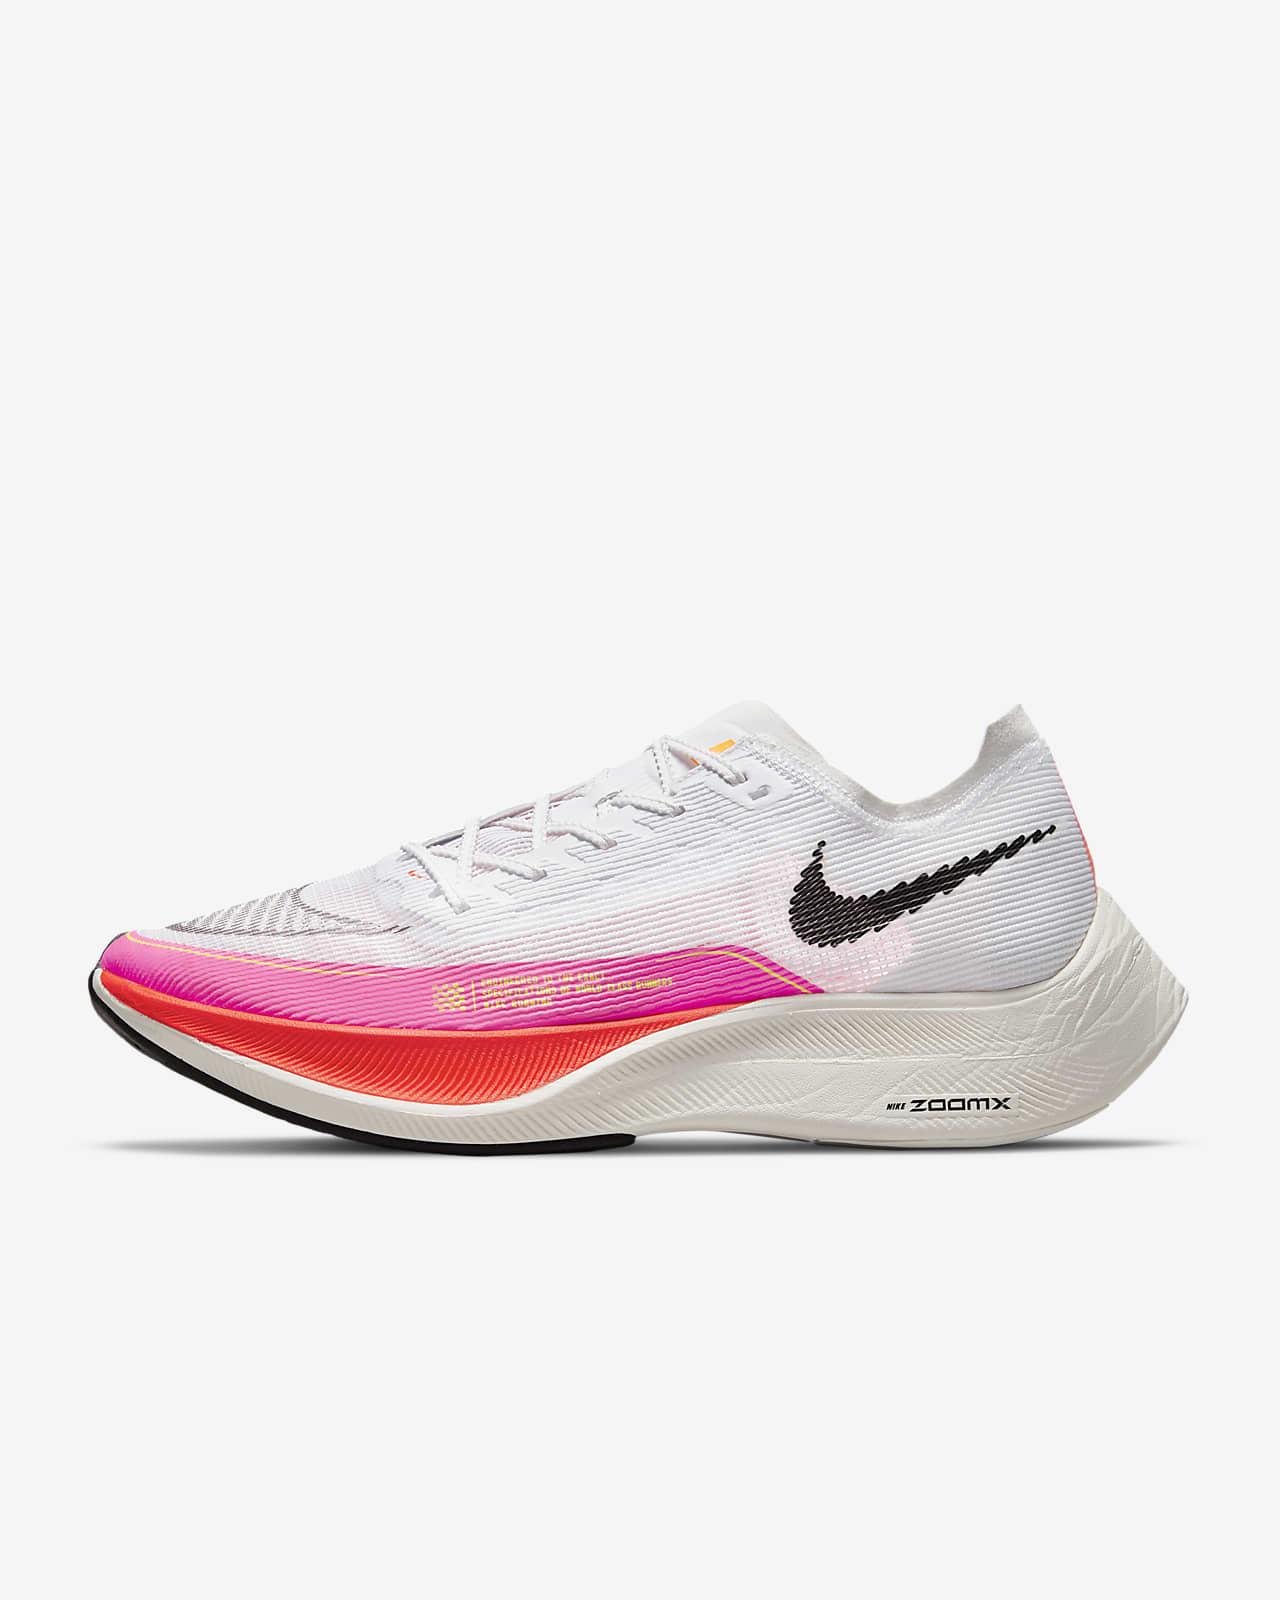 Nike ZoomX Vaporfly Next% 2 Men's Road Racing Shoe